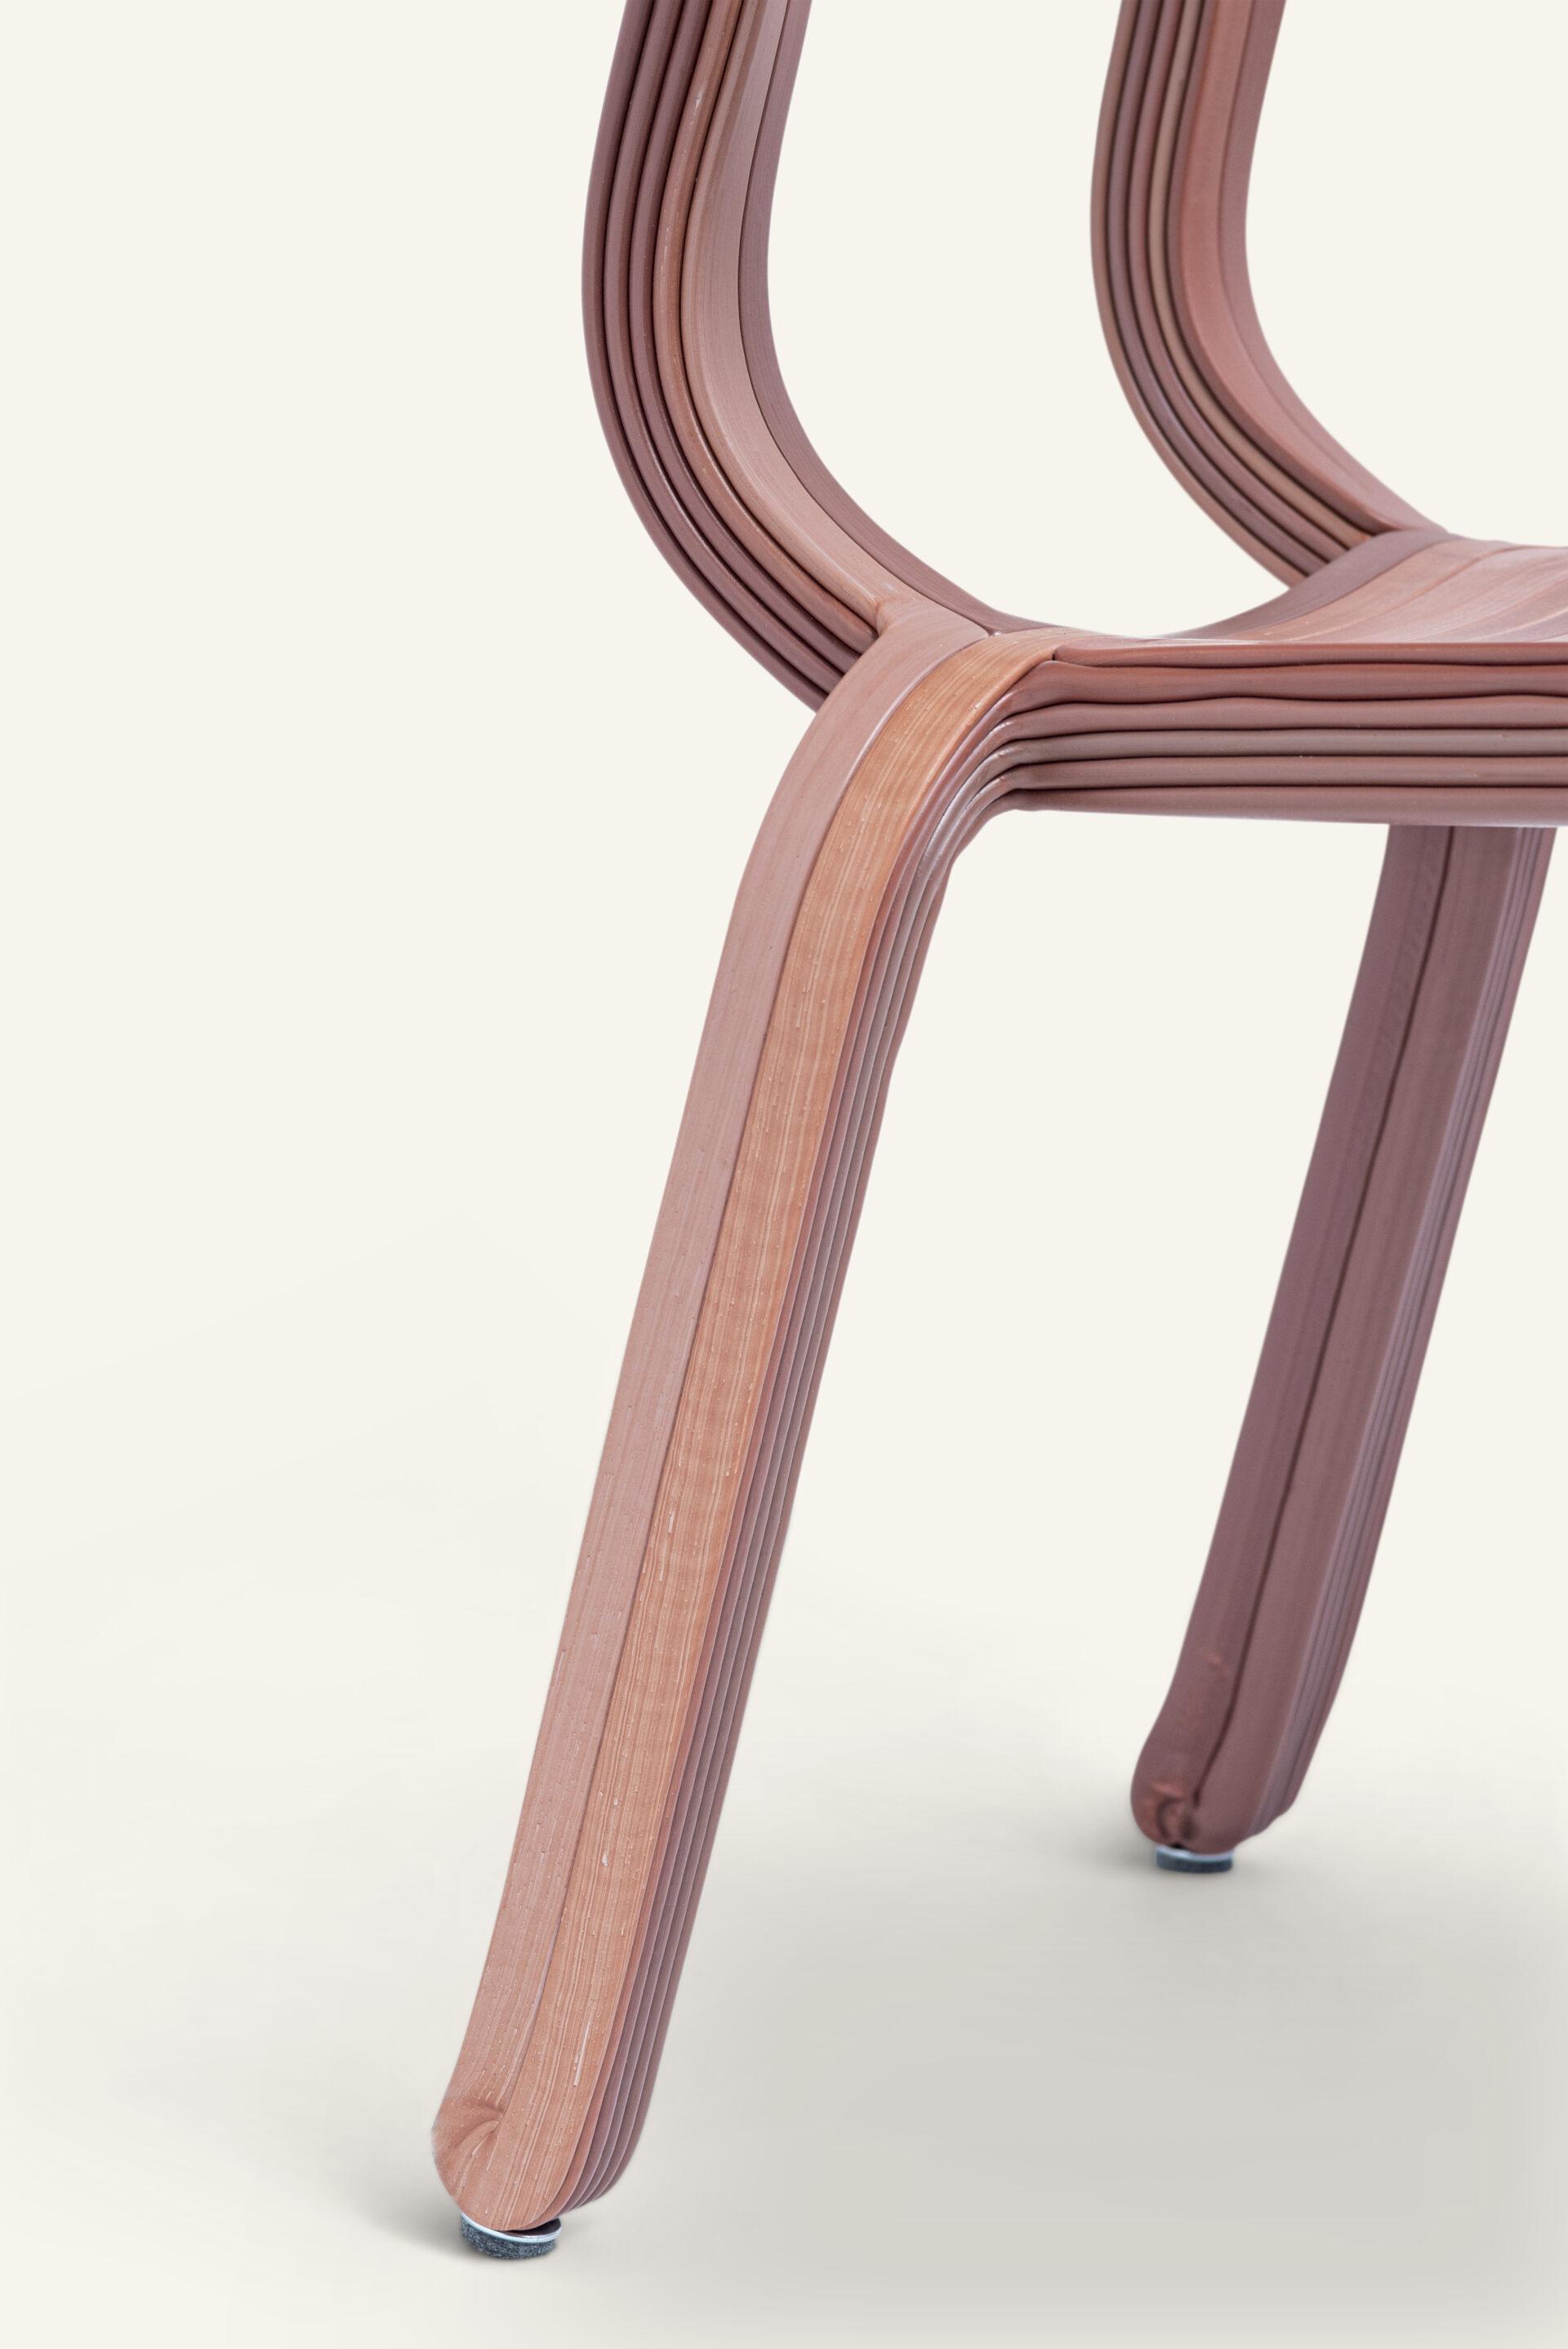 KOOIJ RVR Chair Brick